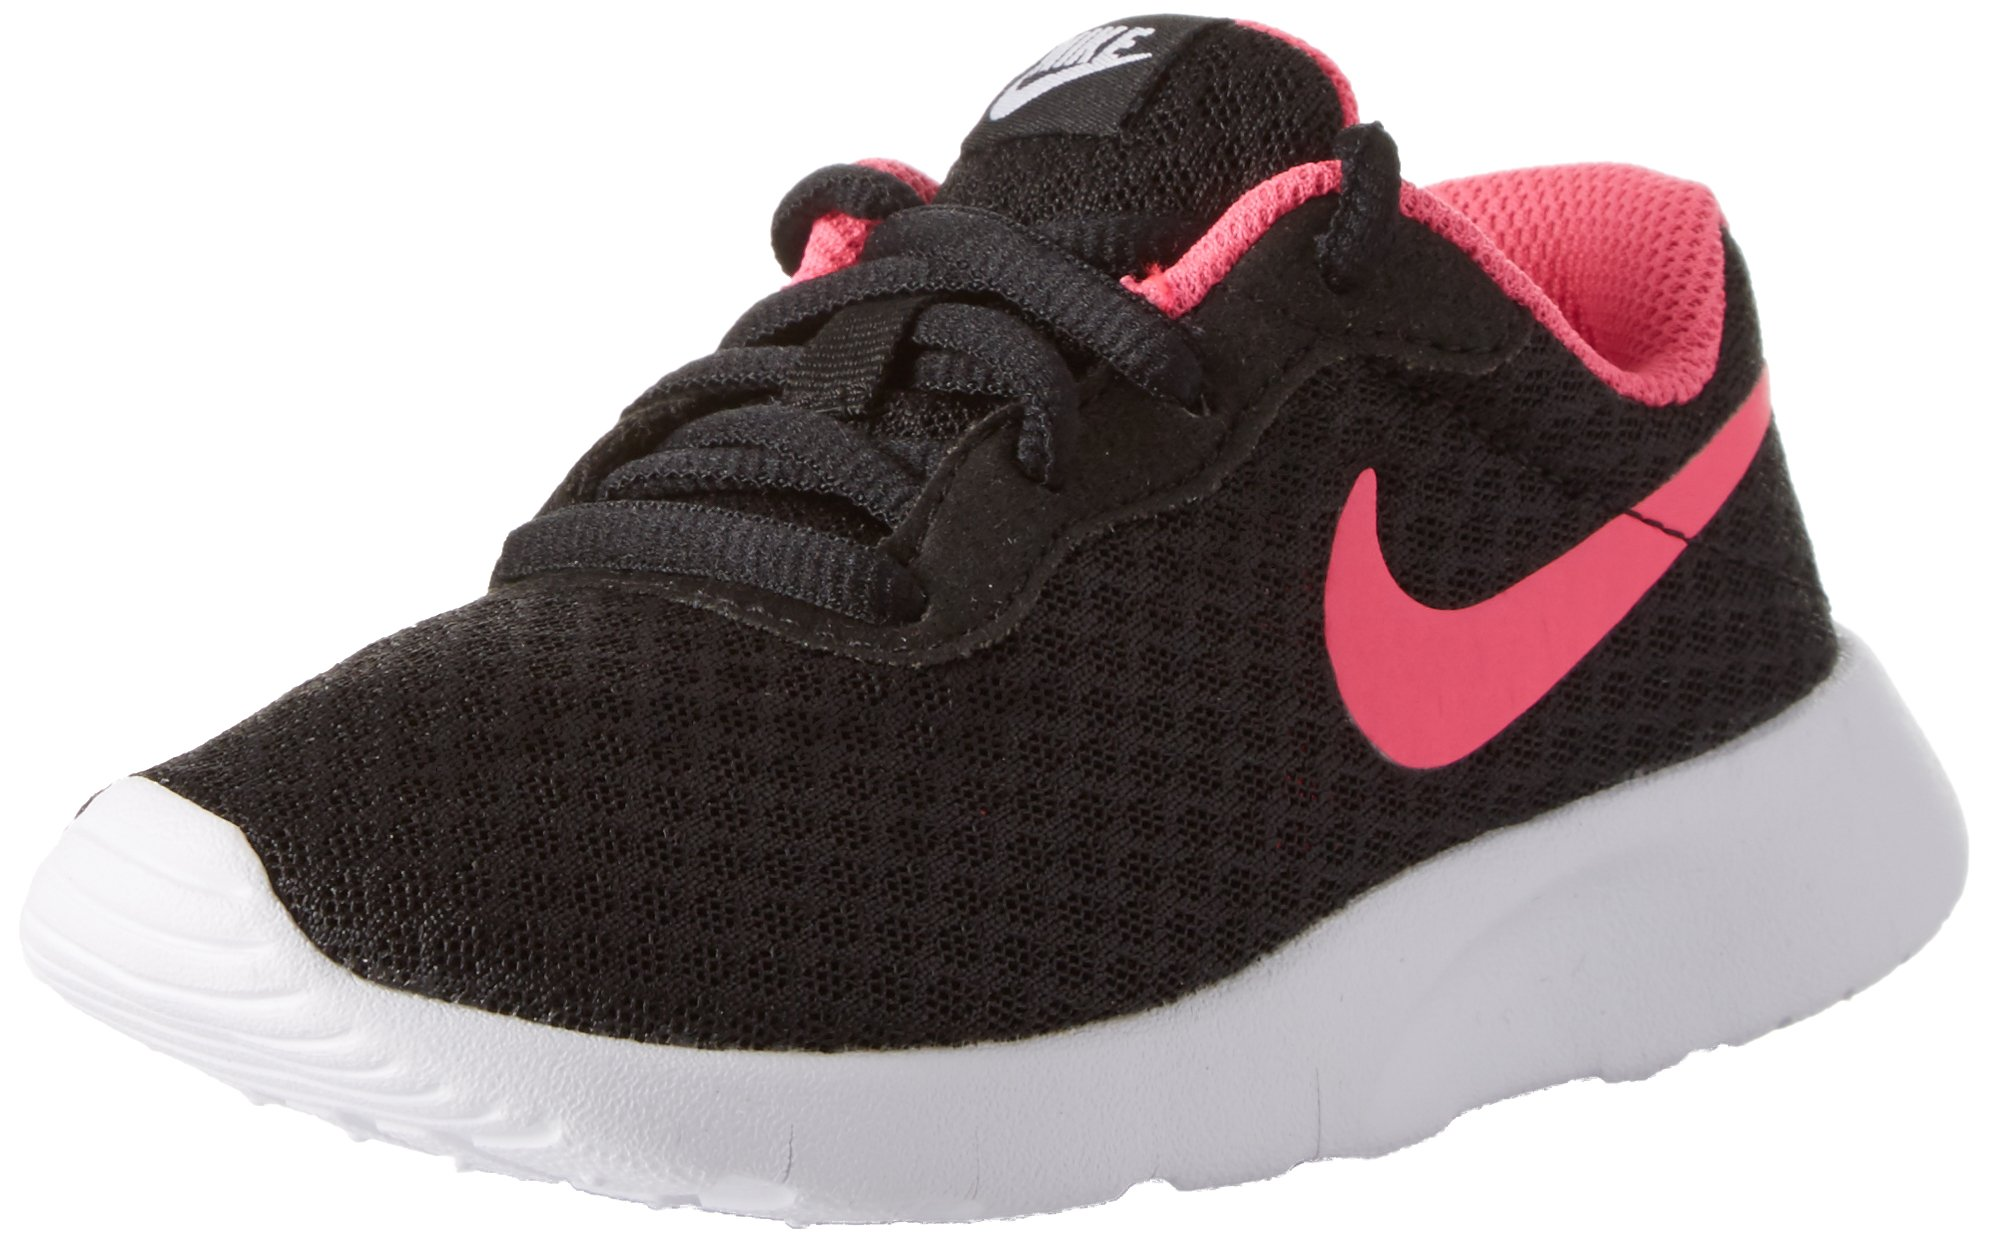 Nike Girl's Tanjun (PS) Running Shoes (11 Little Kid M, Black/Hyper Pink/White)